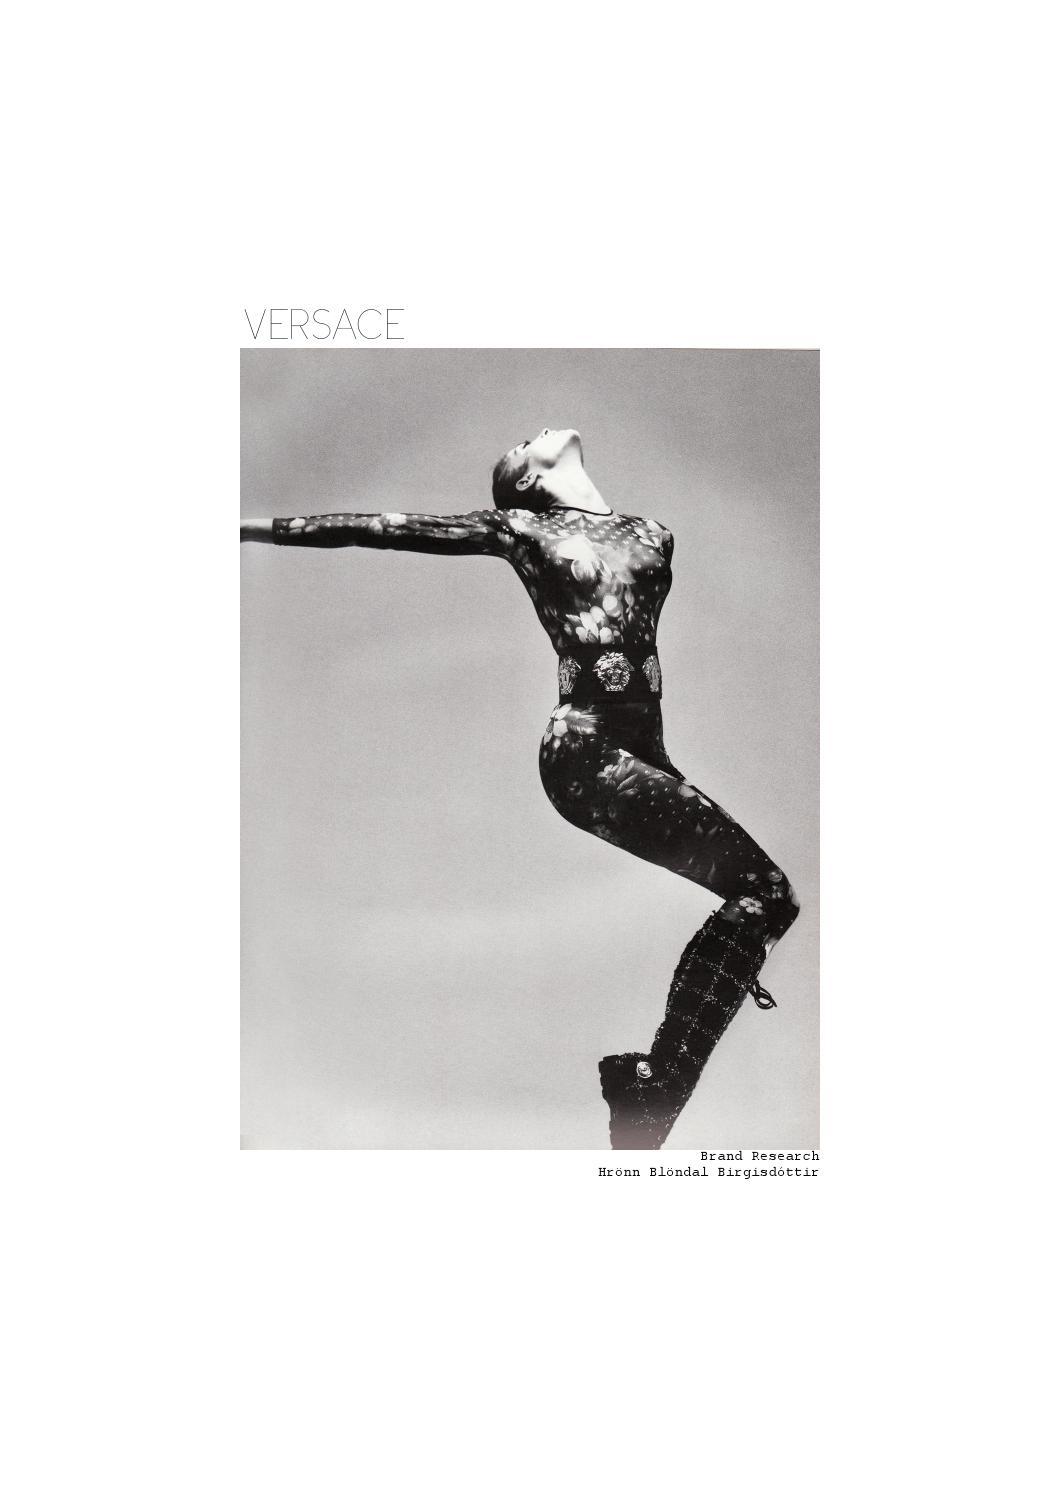 Versace Research By Hrnn B Issuu